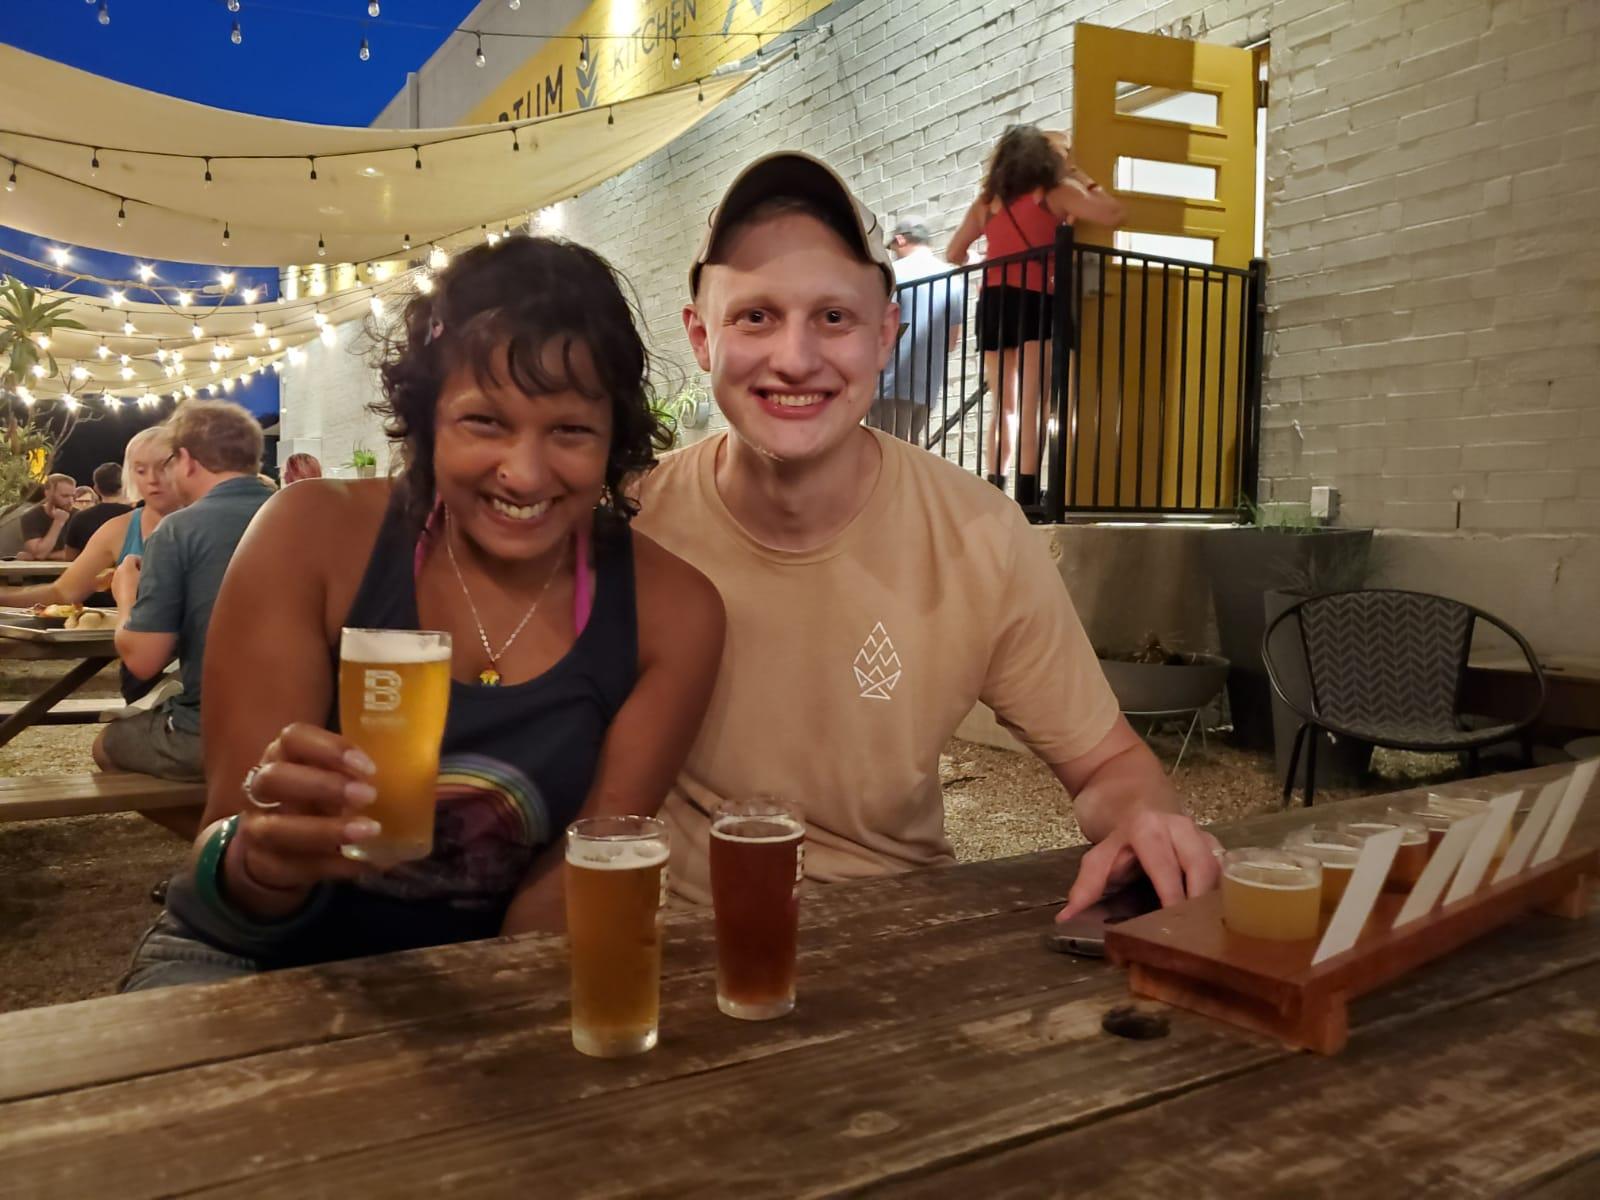 Brewery Travels (Joel Geier) and Craft Beer Amethyst (Ruvani de Silva) at the Brewtorium